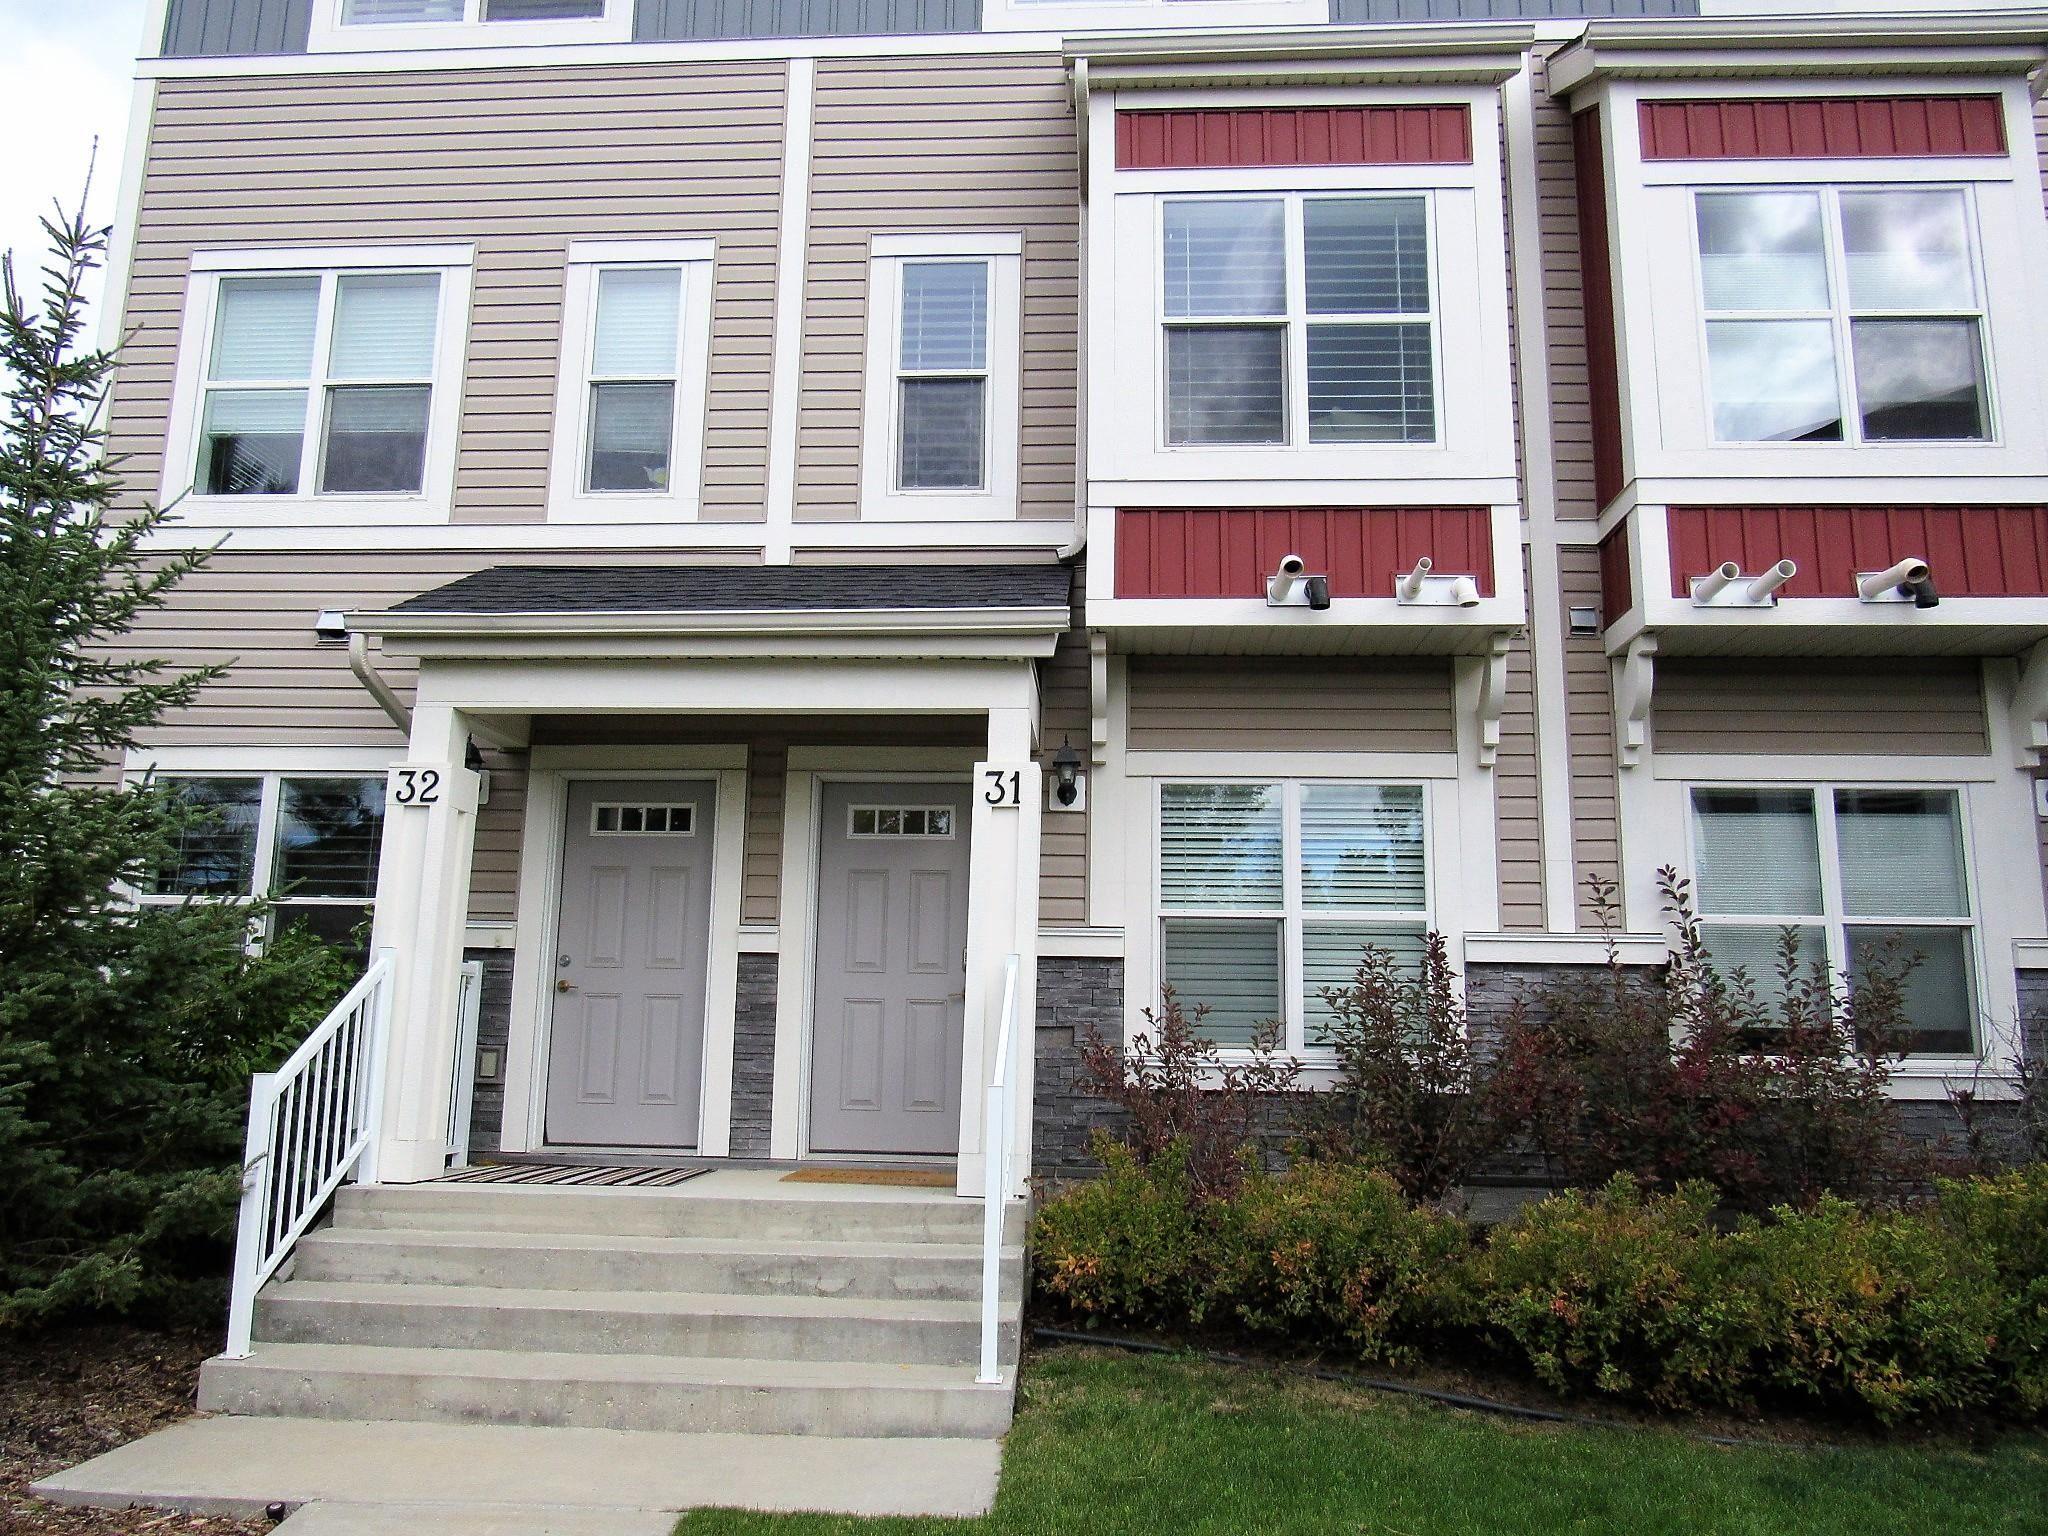 Main Photo: #31 3710 ALLAN Drive in Edmonton: Zone 56 Townhouse for sale : MLS®# E4263227